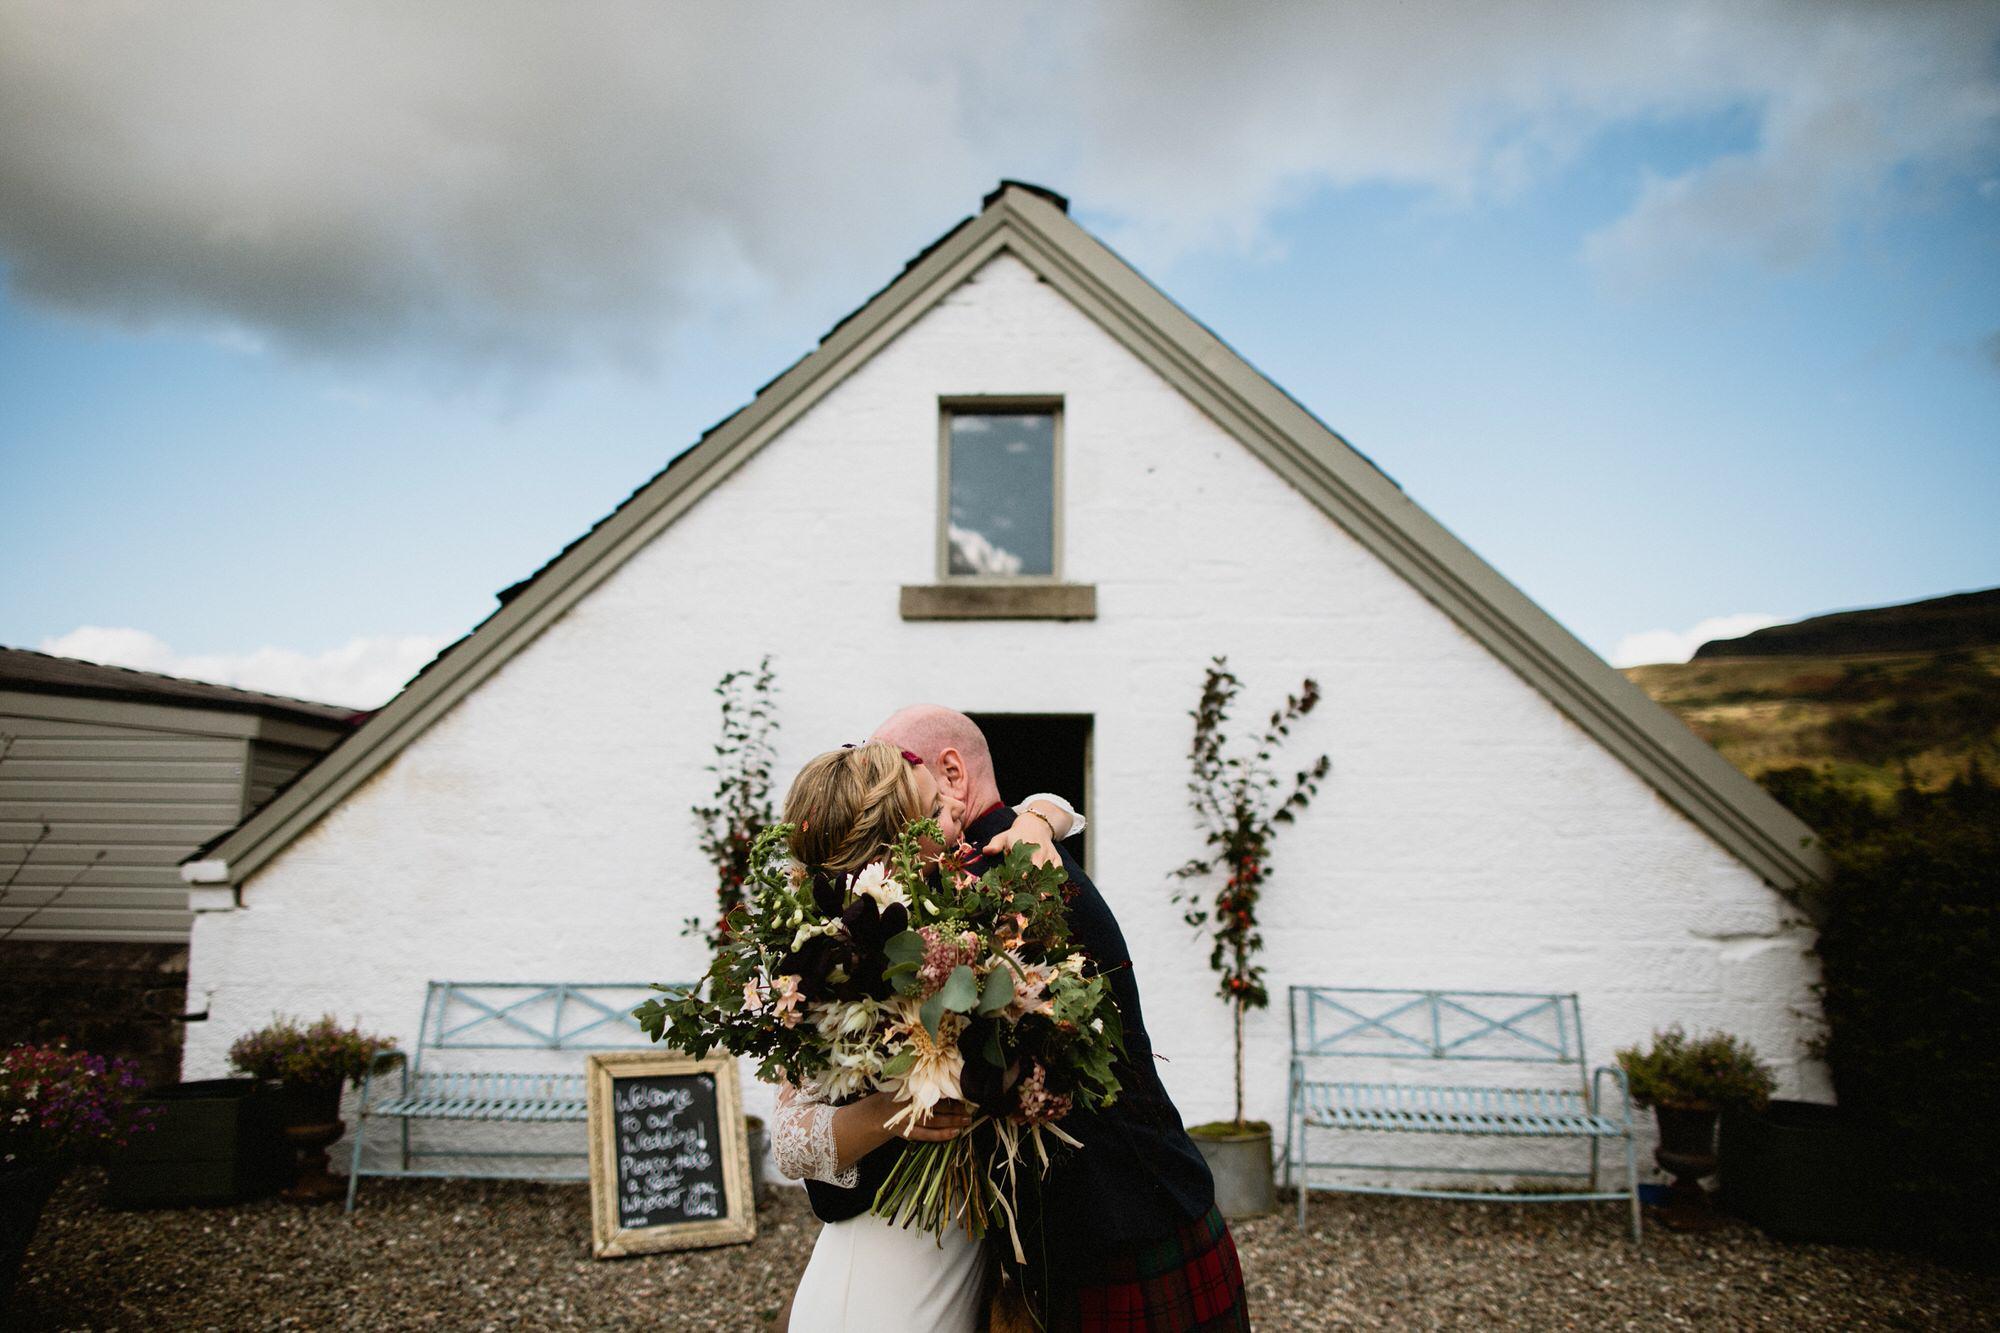 024 STONE BOTHY JUST MARRIED TIN SHED KNOCKRAICH WEDDING AUTUMN ZOE ALEXANDRA PHOTOGRAPHY